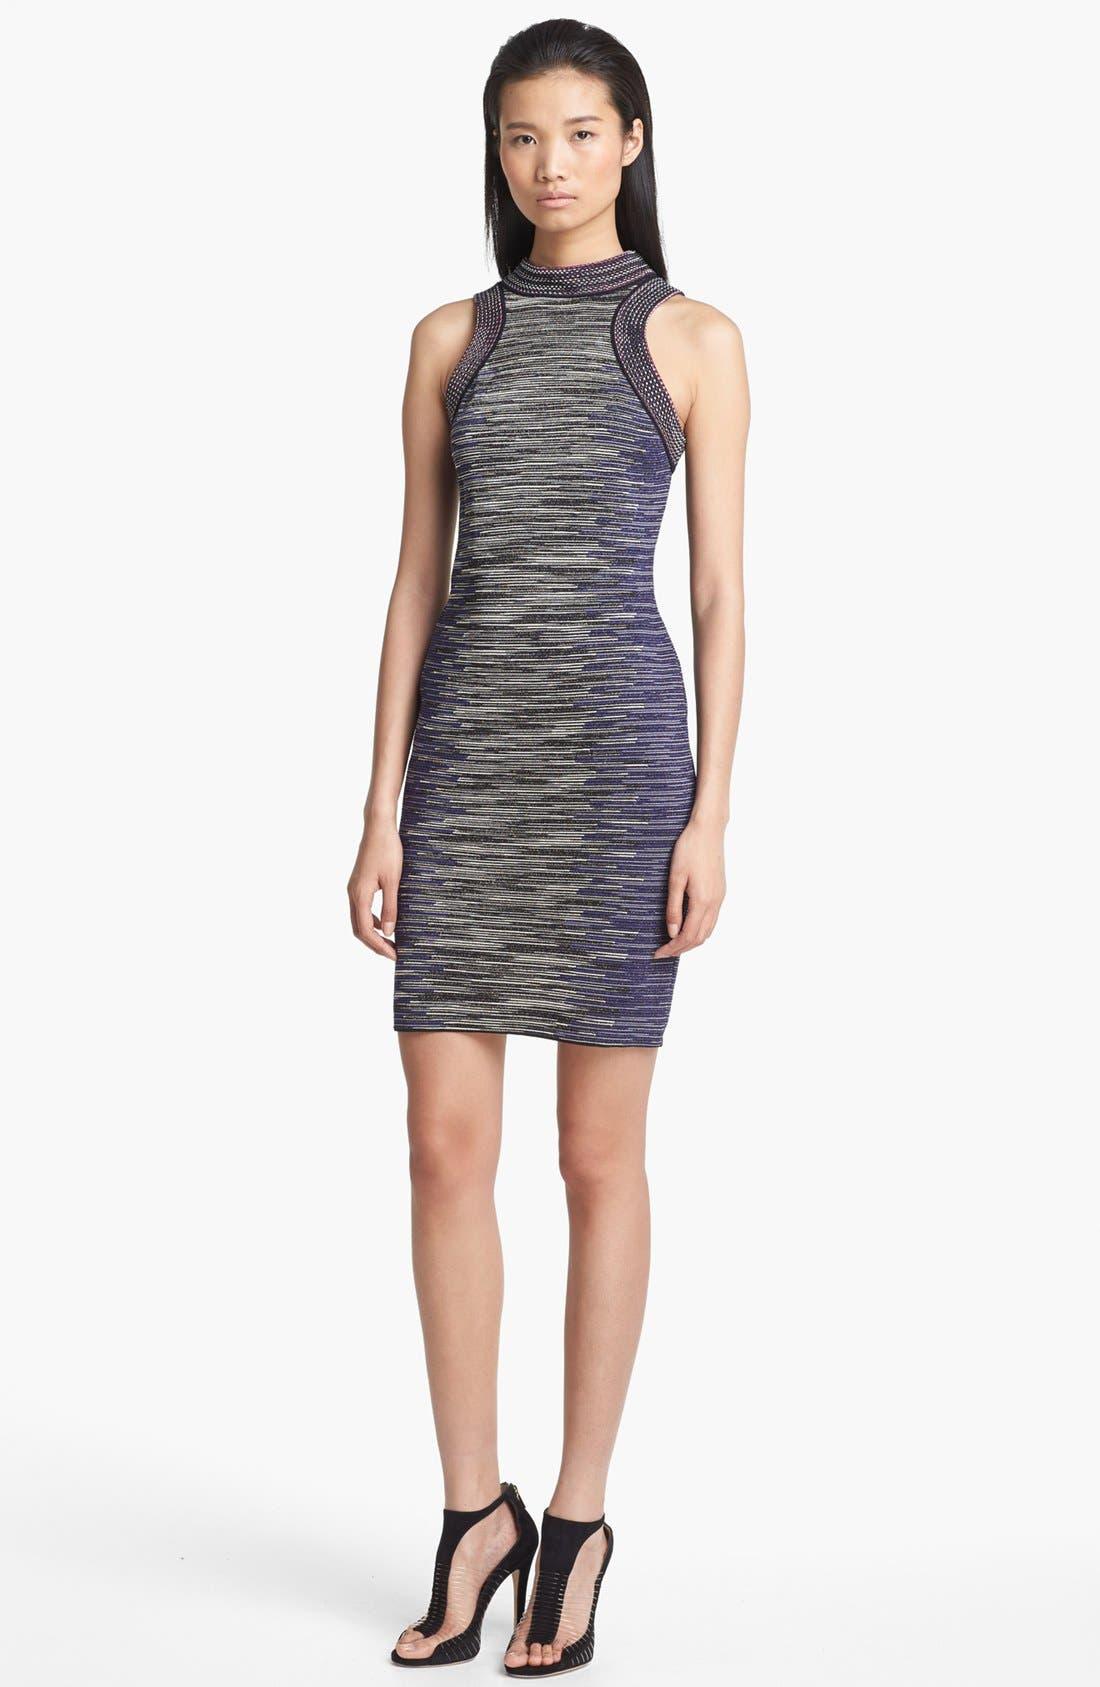 Alternate Image 1 Selected - M Missoni Space Dye Scuba Dress